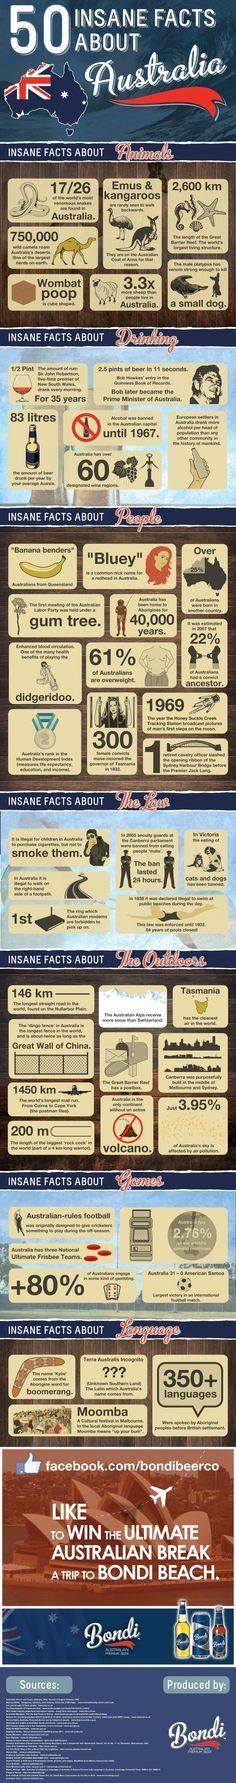 50 insane facts about Australia